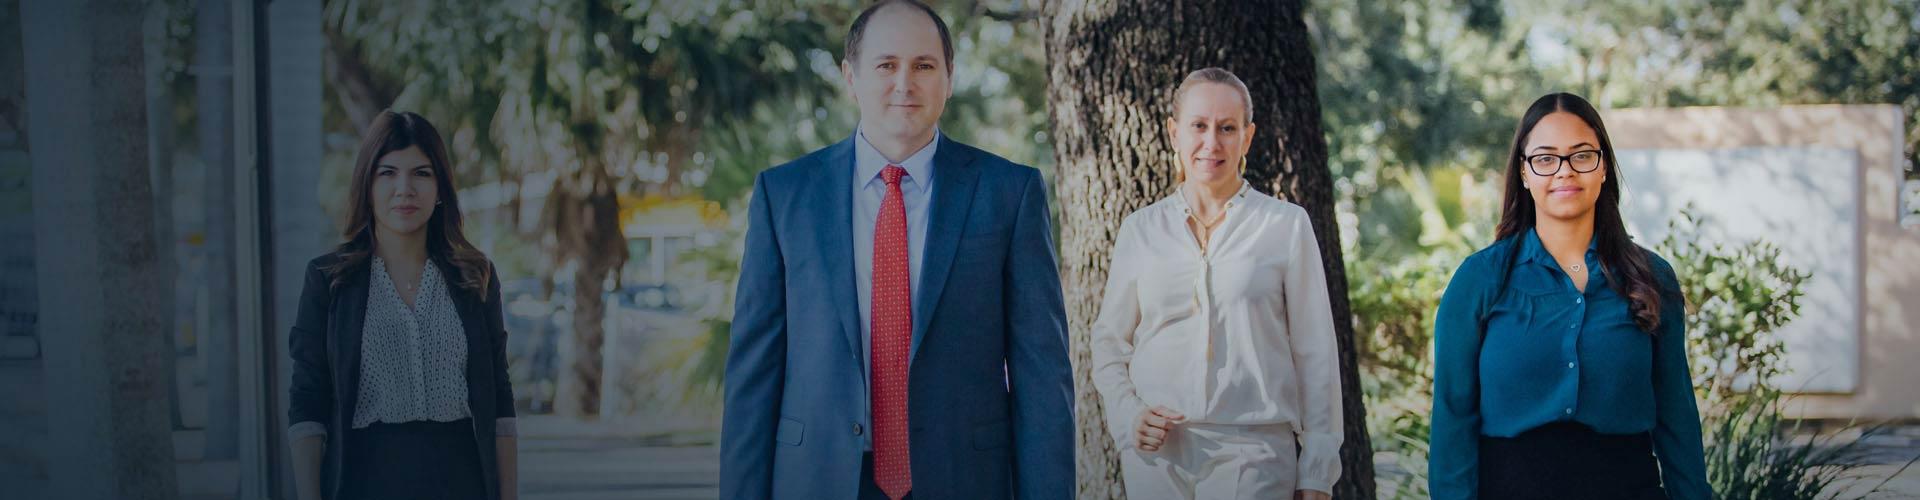 West Palm Beach Bankruptcy Attorneys - Stiberman Law Firm